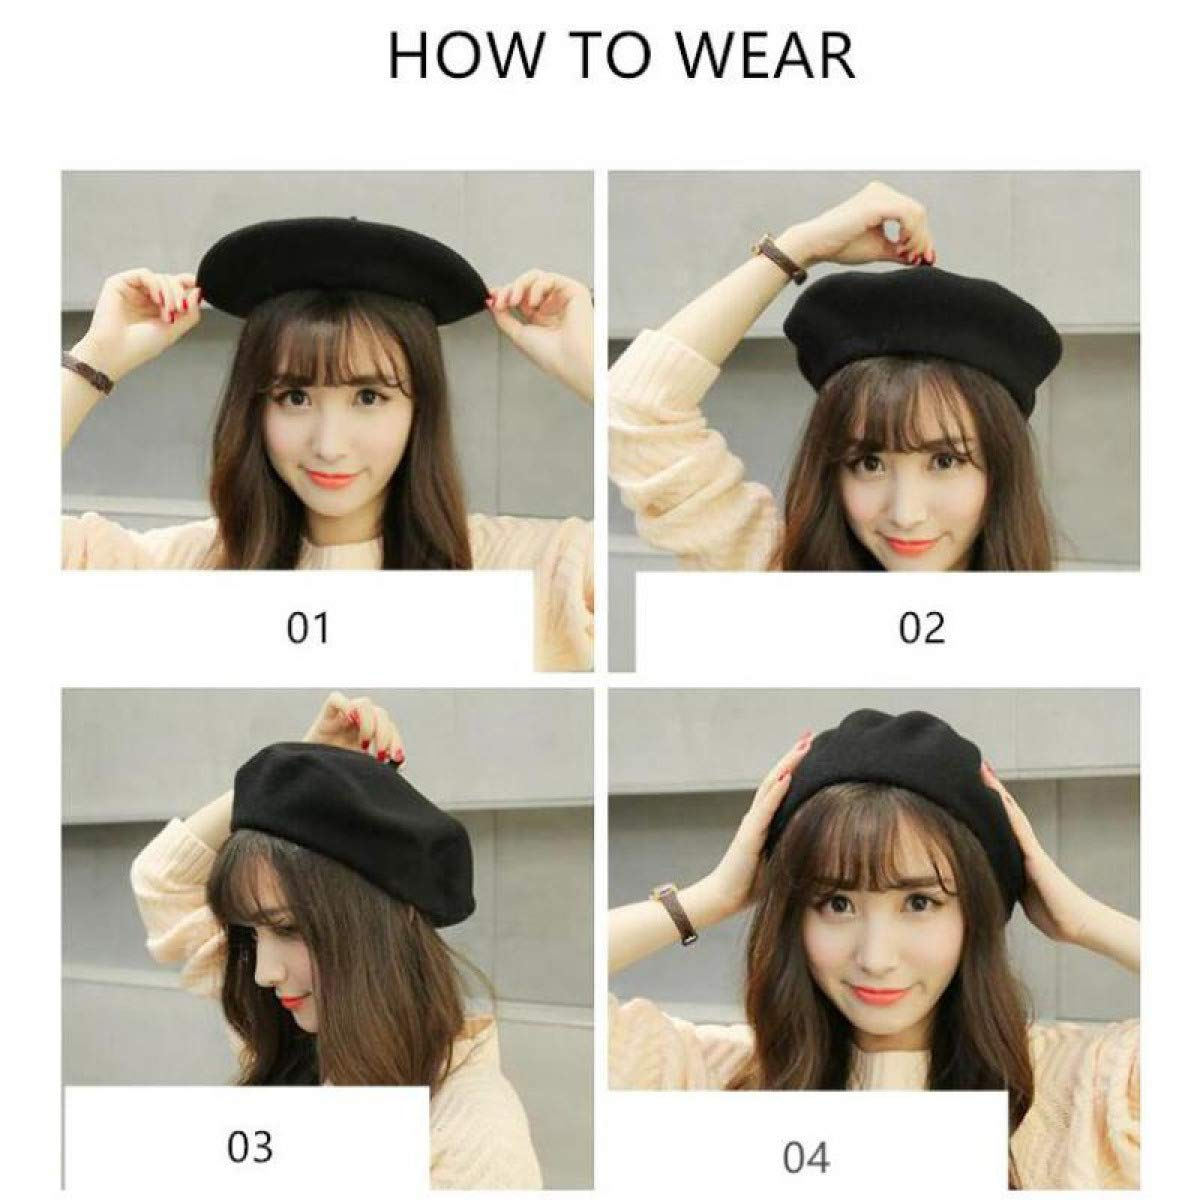 FLAMINGO/_STORE Wool Beret Female Winter Hats for Women Flat Cap Knit 100/% Cashmere Hats Lady Girl Berets Hat Female Bone Tocas Painter Hat Navy Blue